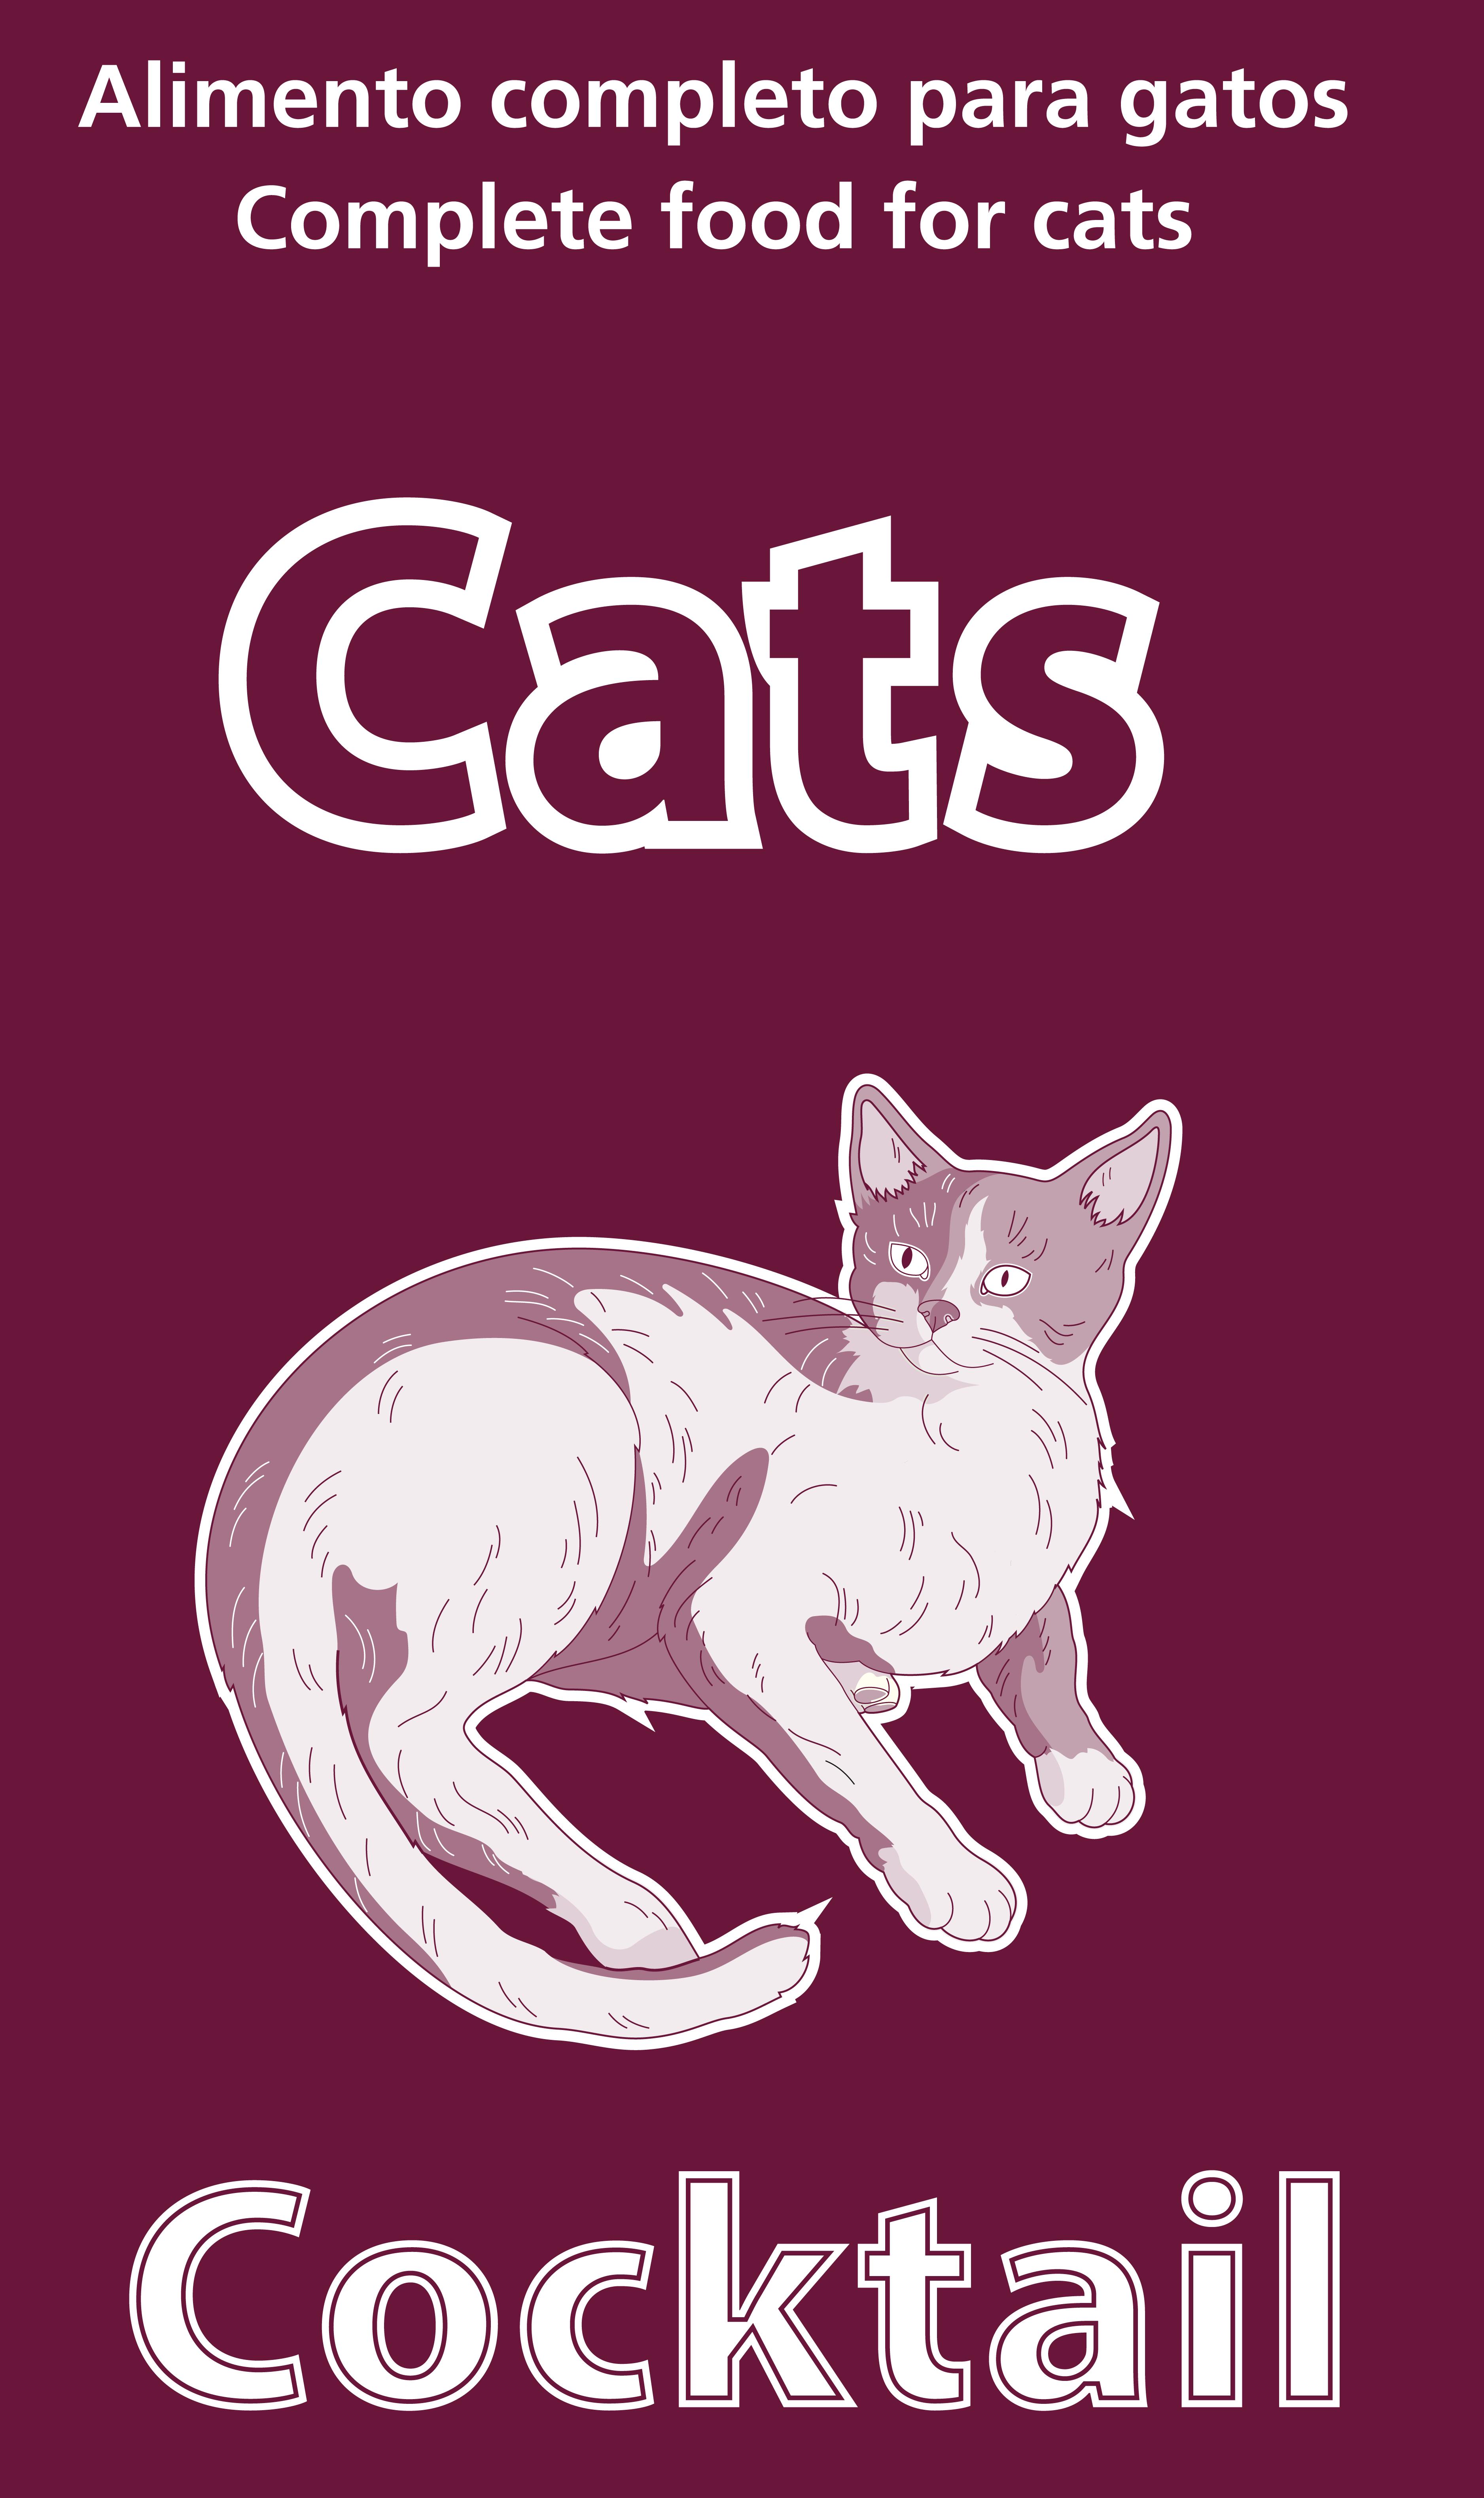 Cat Cocktail